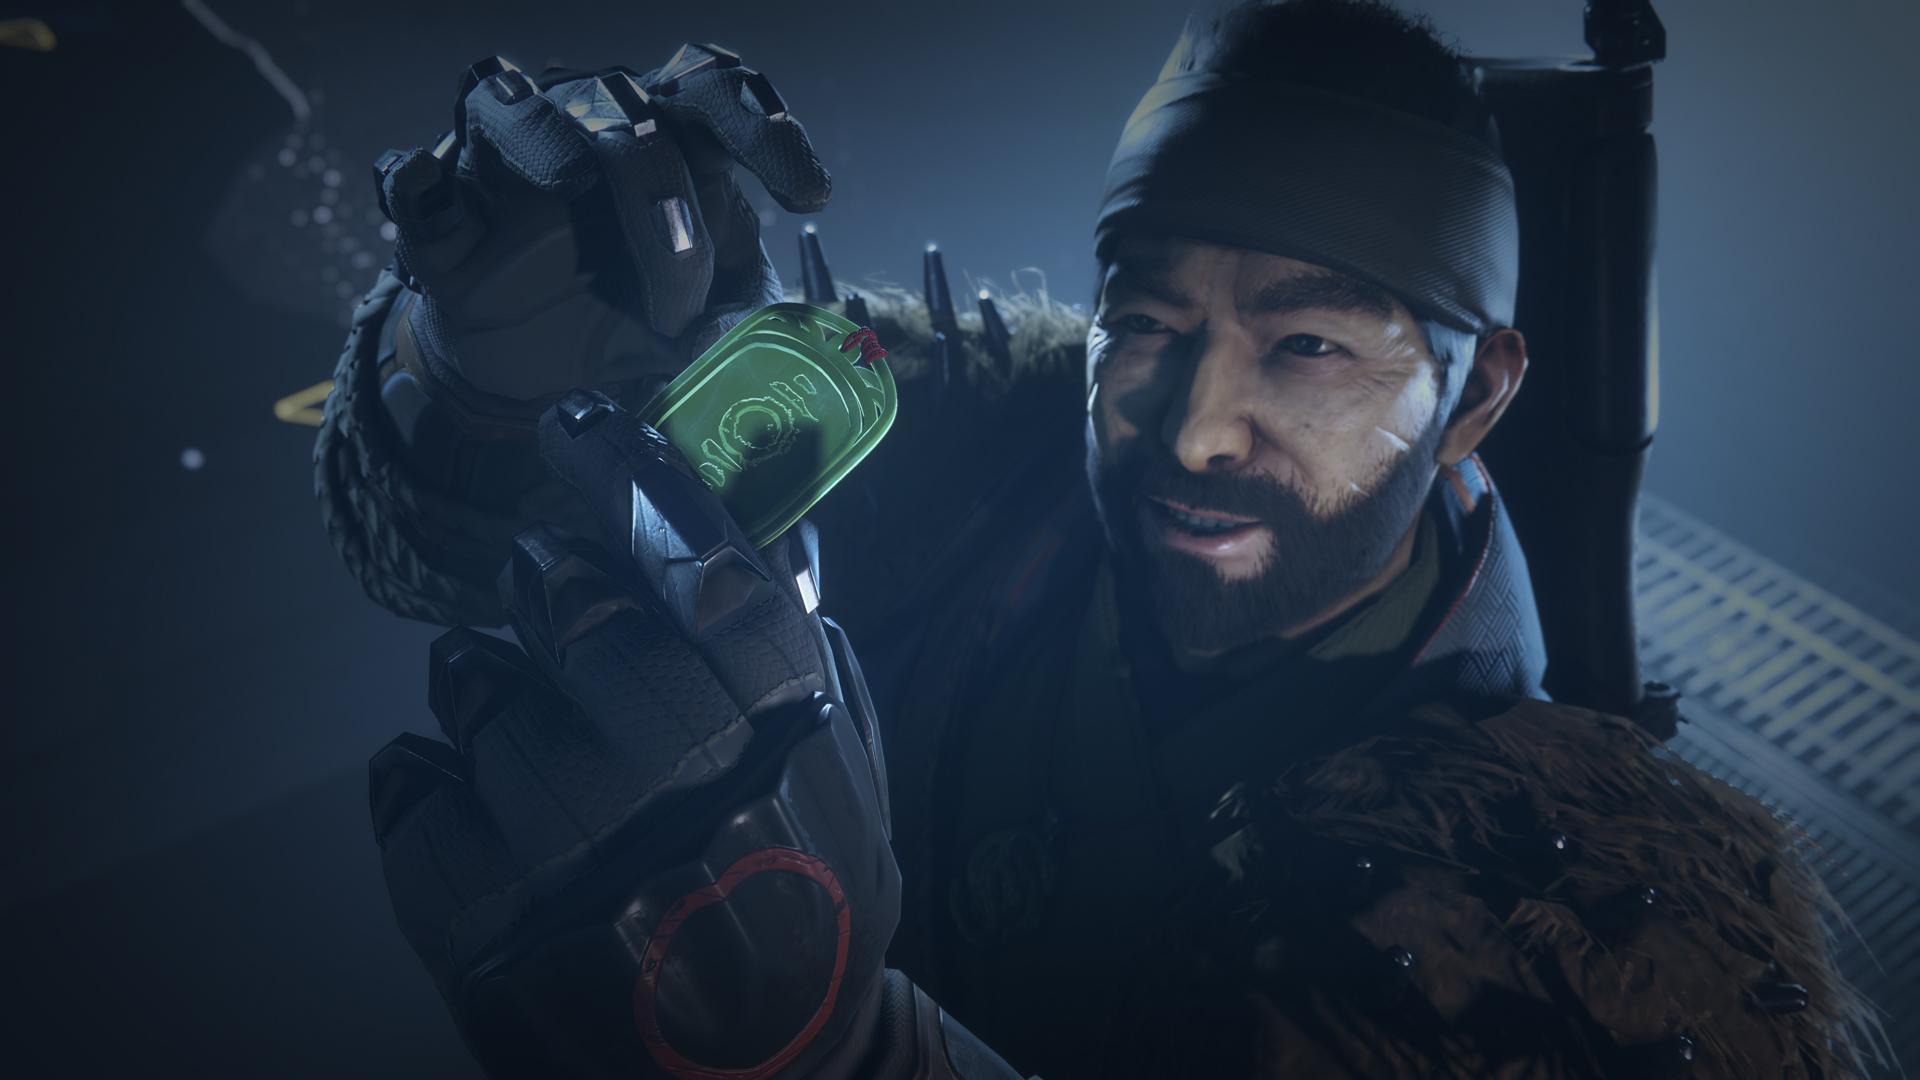 destiny 2, service revolver